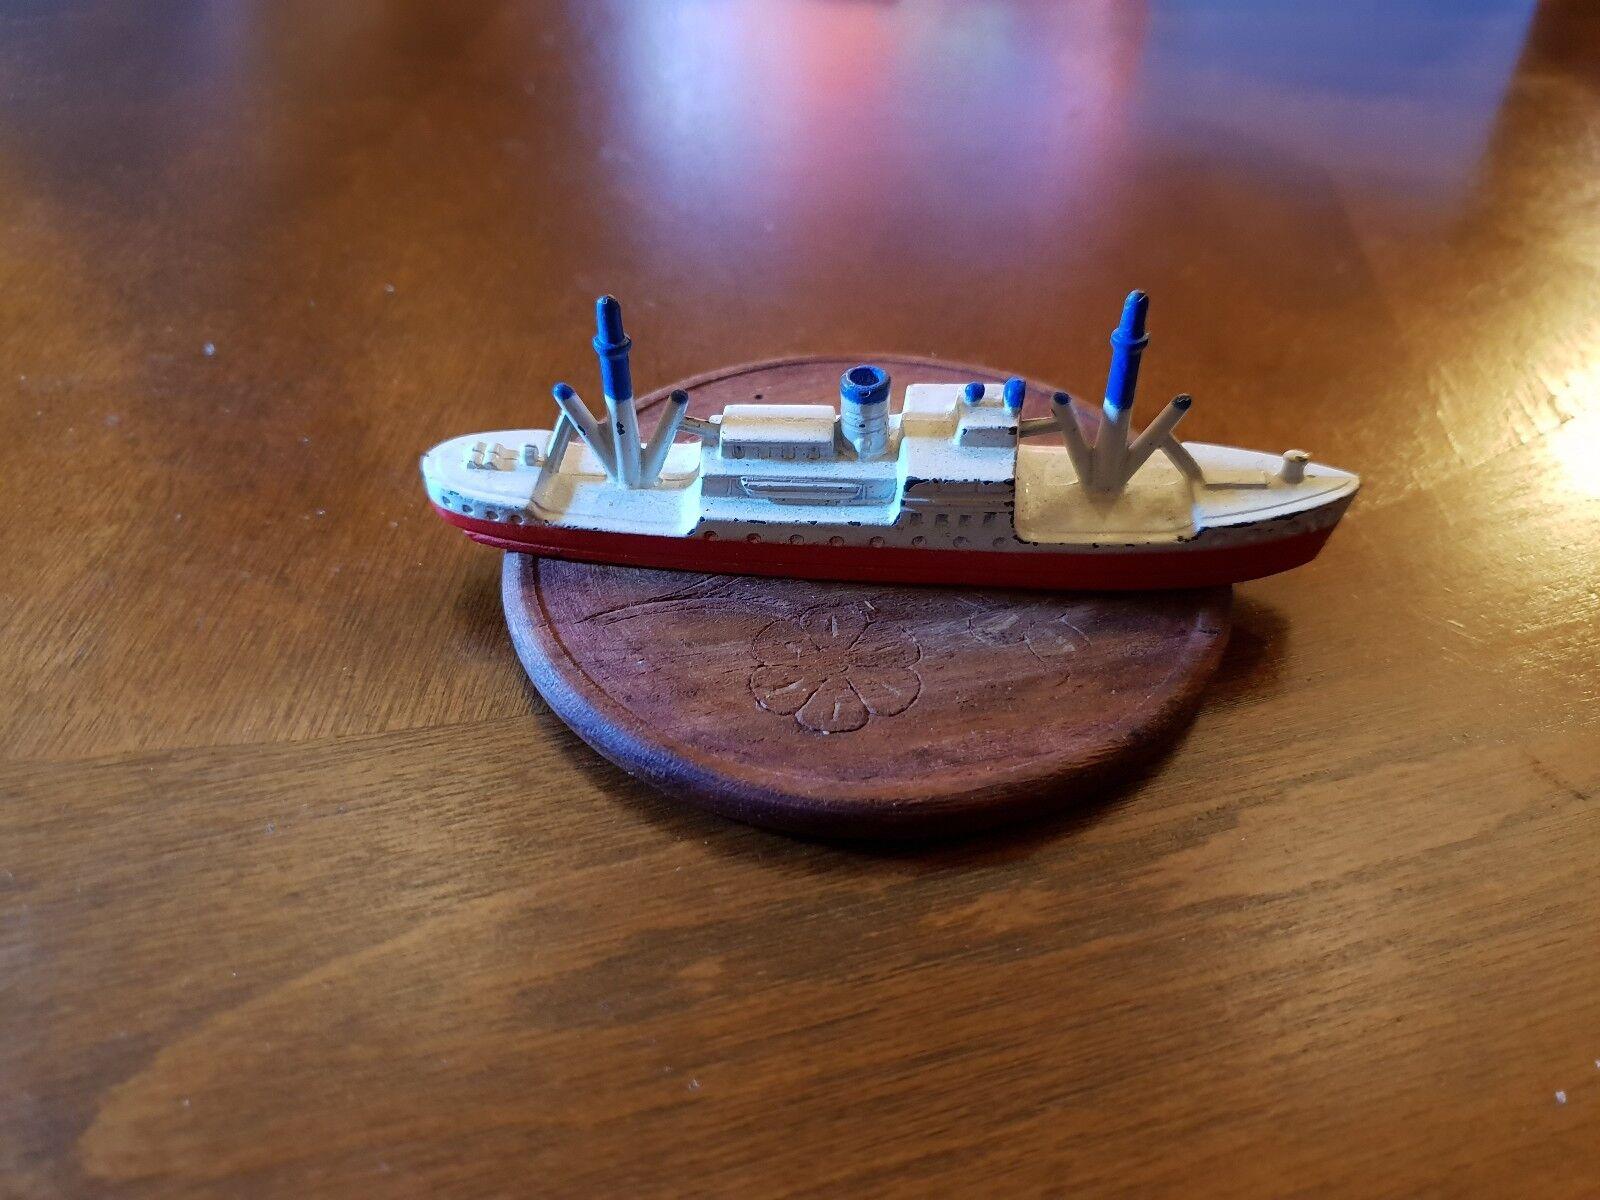 diseño único TootsieJuguete TootsieJuguete TootsieJuguete no.129 tender Inglés Camuflaje parte inferior de 1941-1942  100% autentico